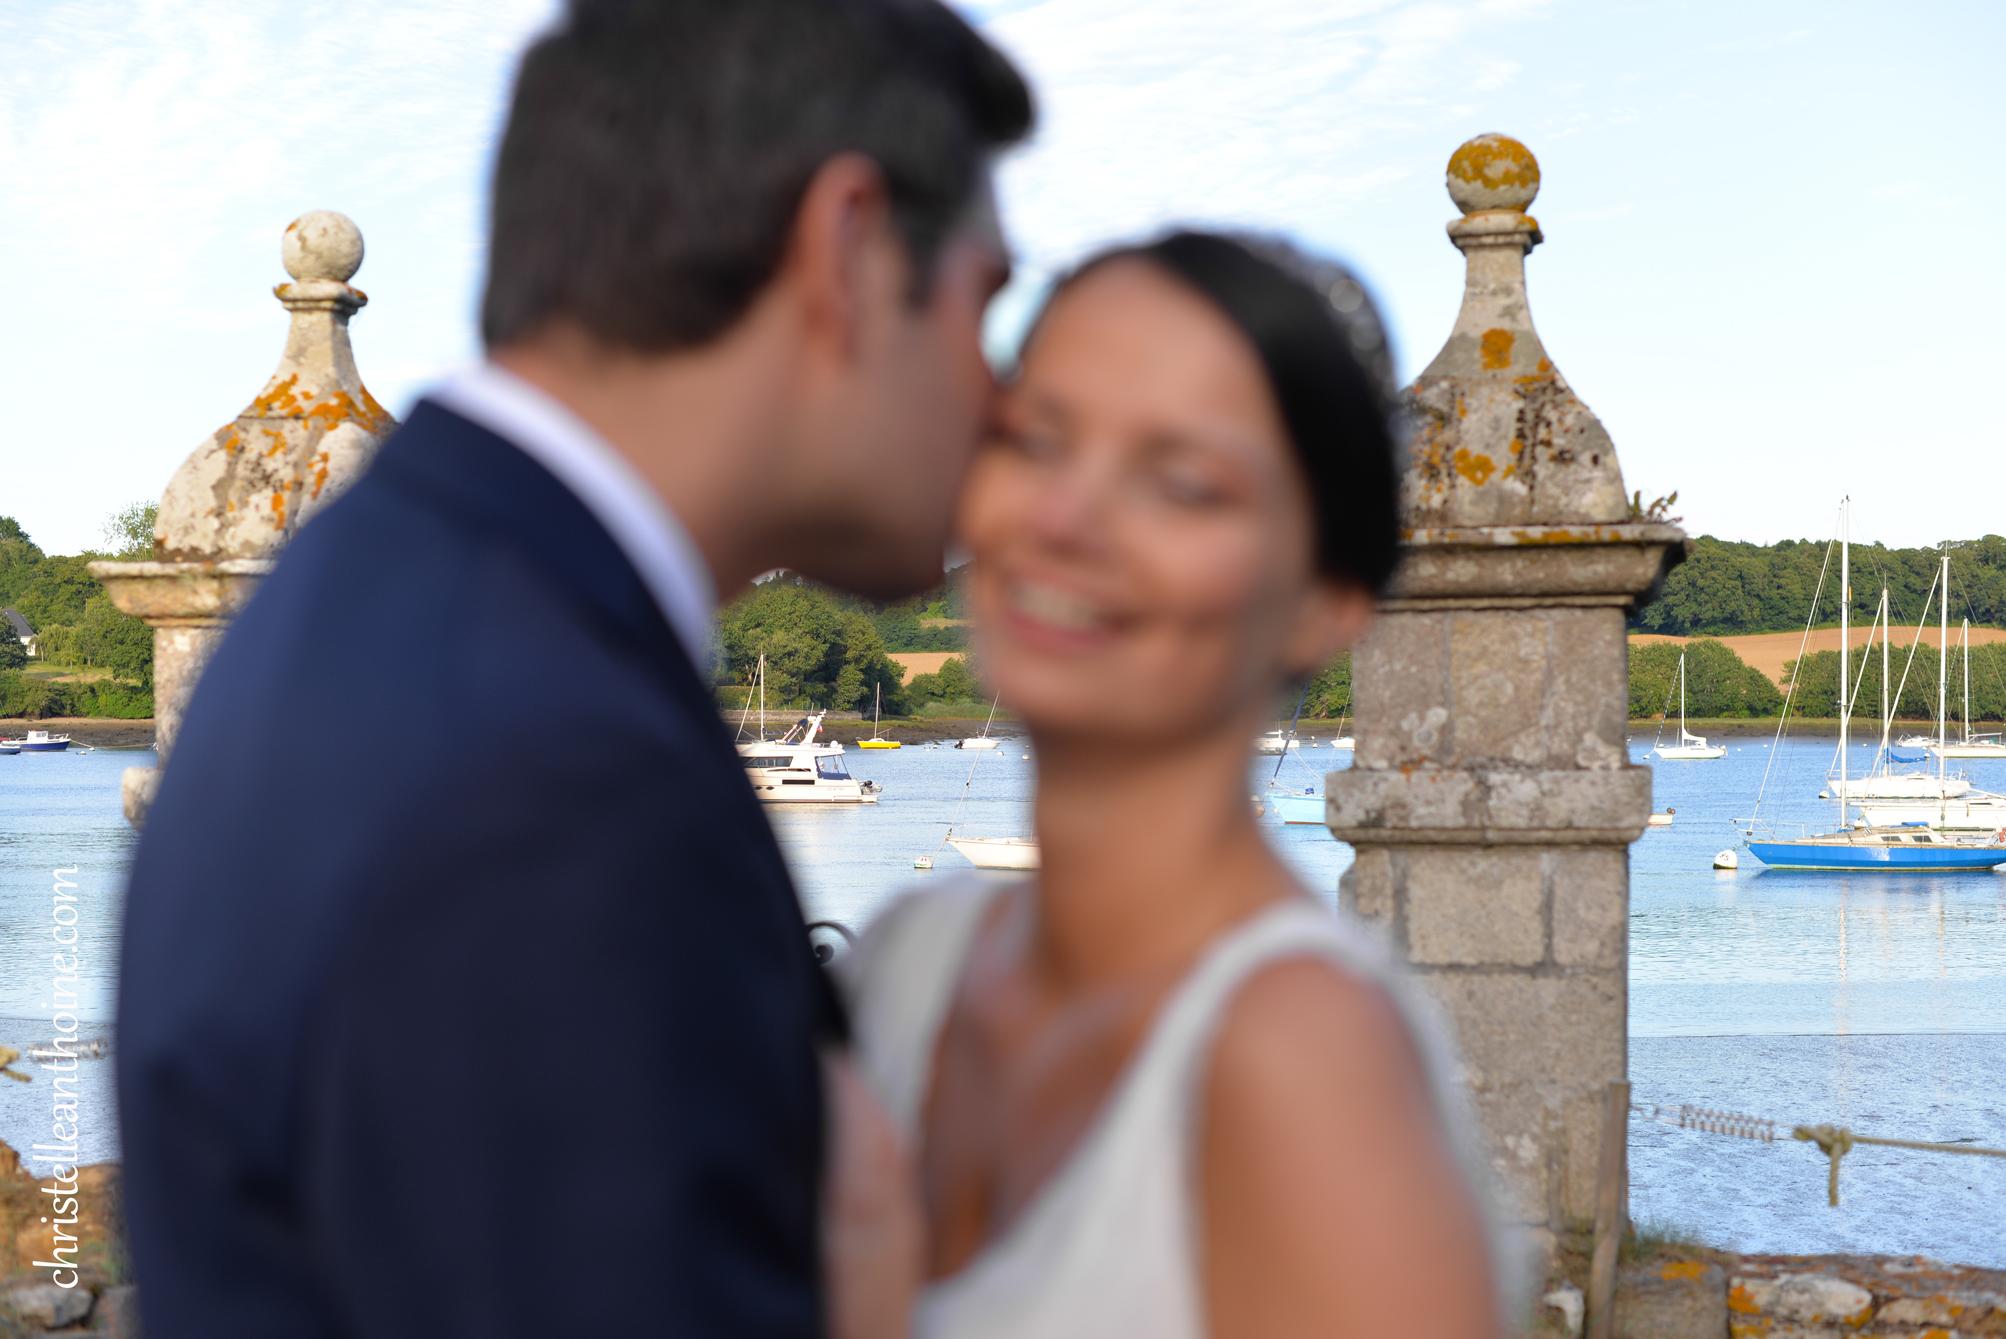 mariage manoir de kerouzien plomelin finistere photographe bretagne christelle anthoine35 - Photographe Mariage Finistere